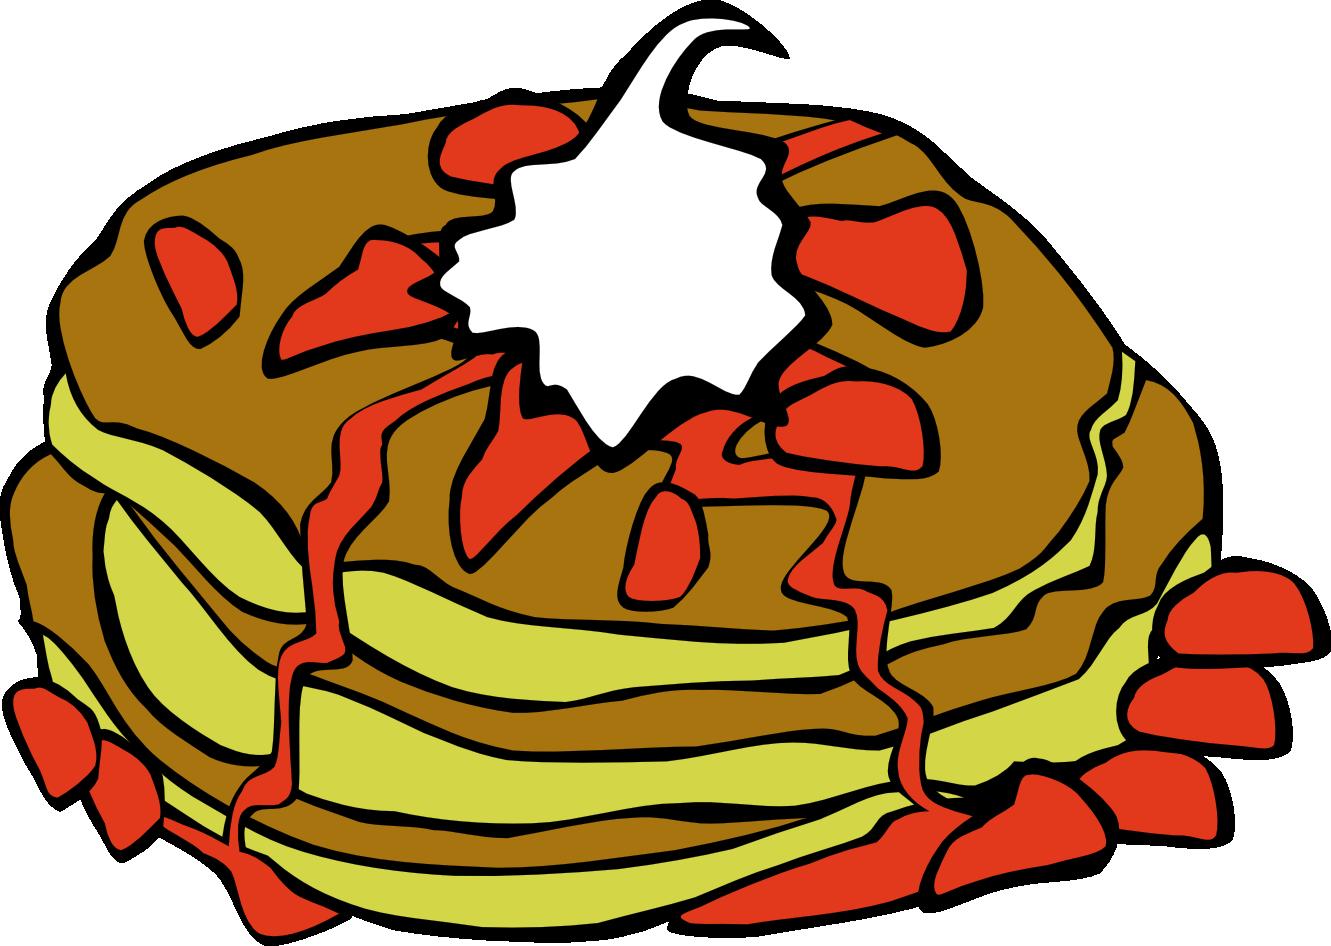 1331x946 Download Breakfast Clip Art Free Clipart Of Breakfast Food 3 Image